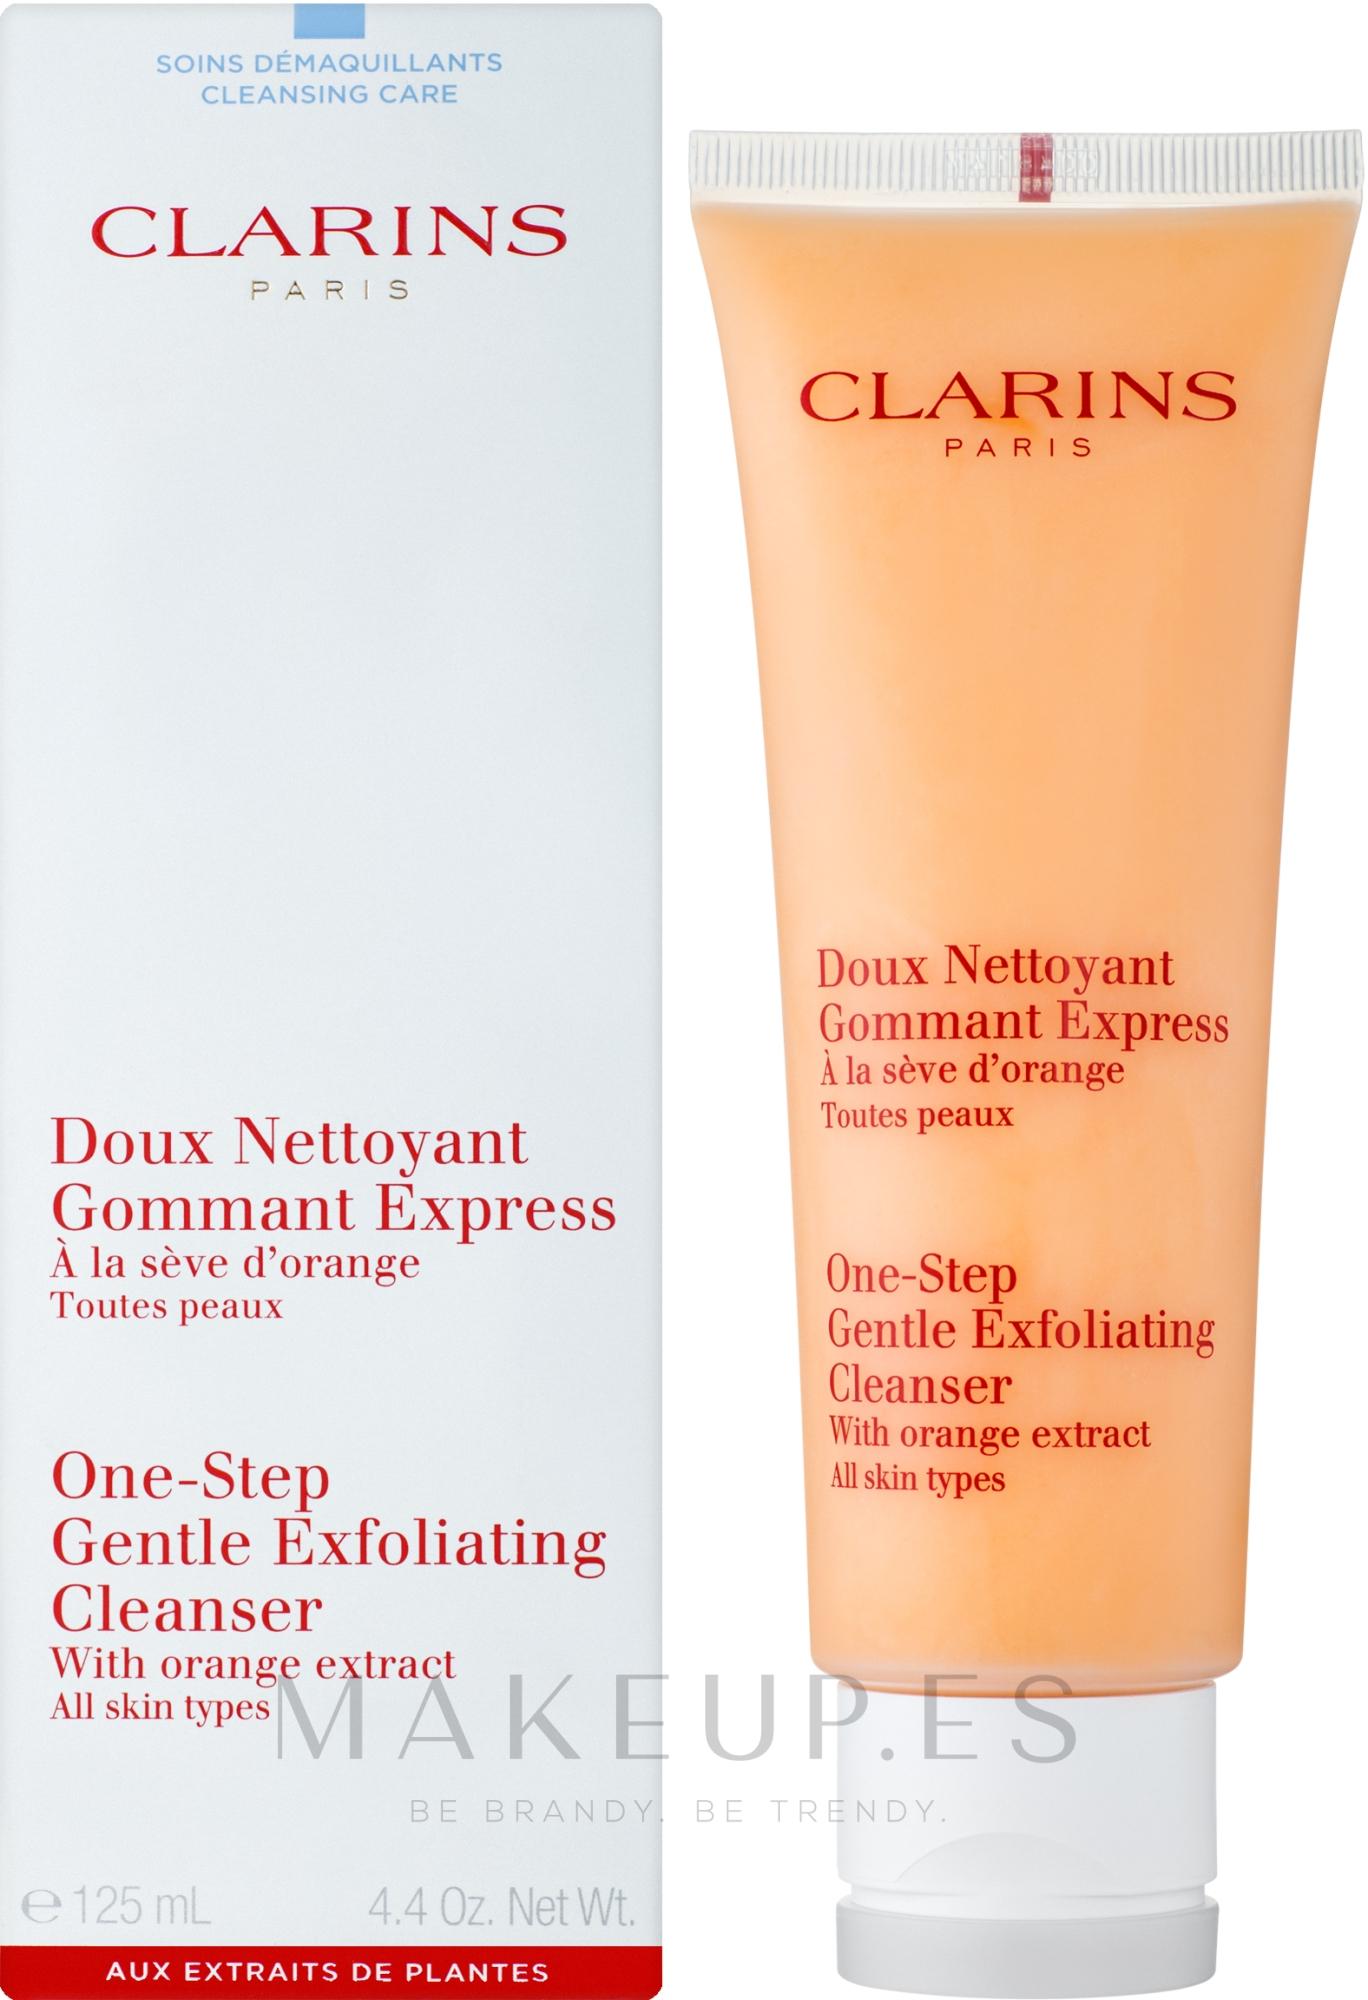 Exfoliante facial con extracto de naranja - Clarins One-Step Gentle Exfoliating Cleanser — imagen 125 ml